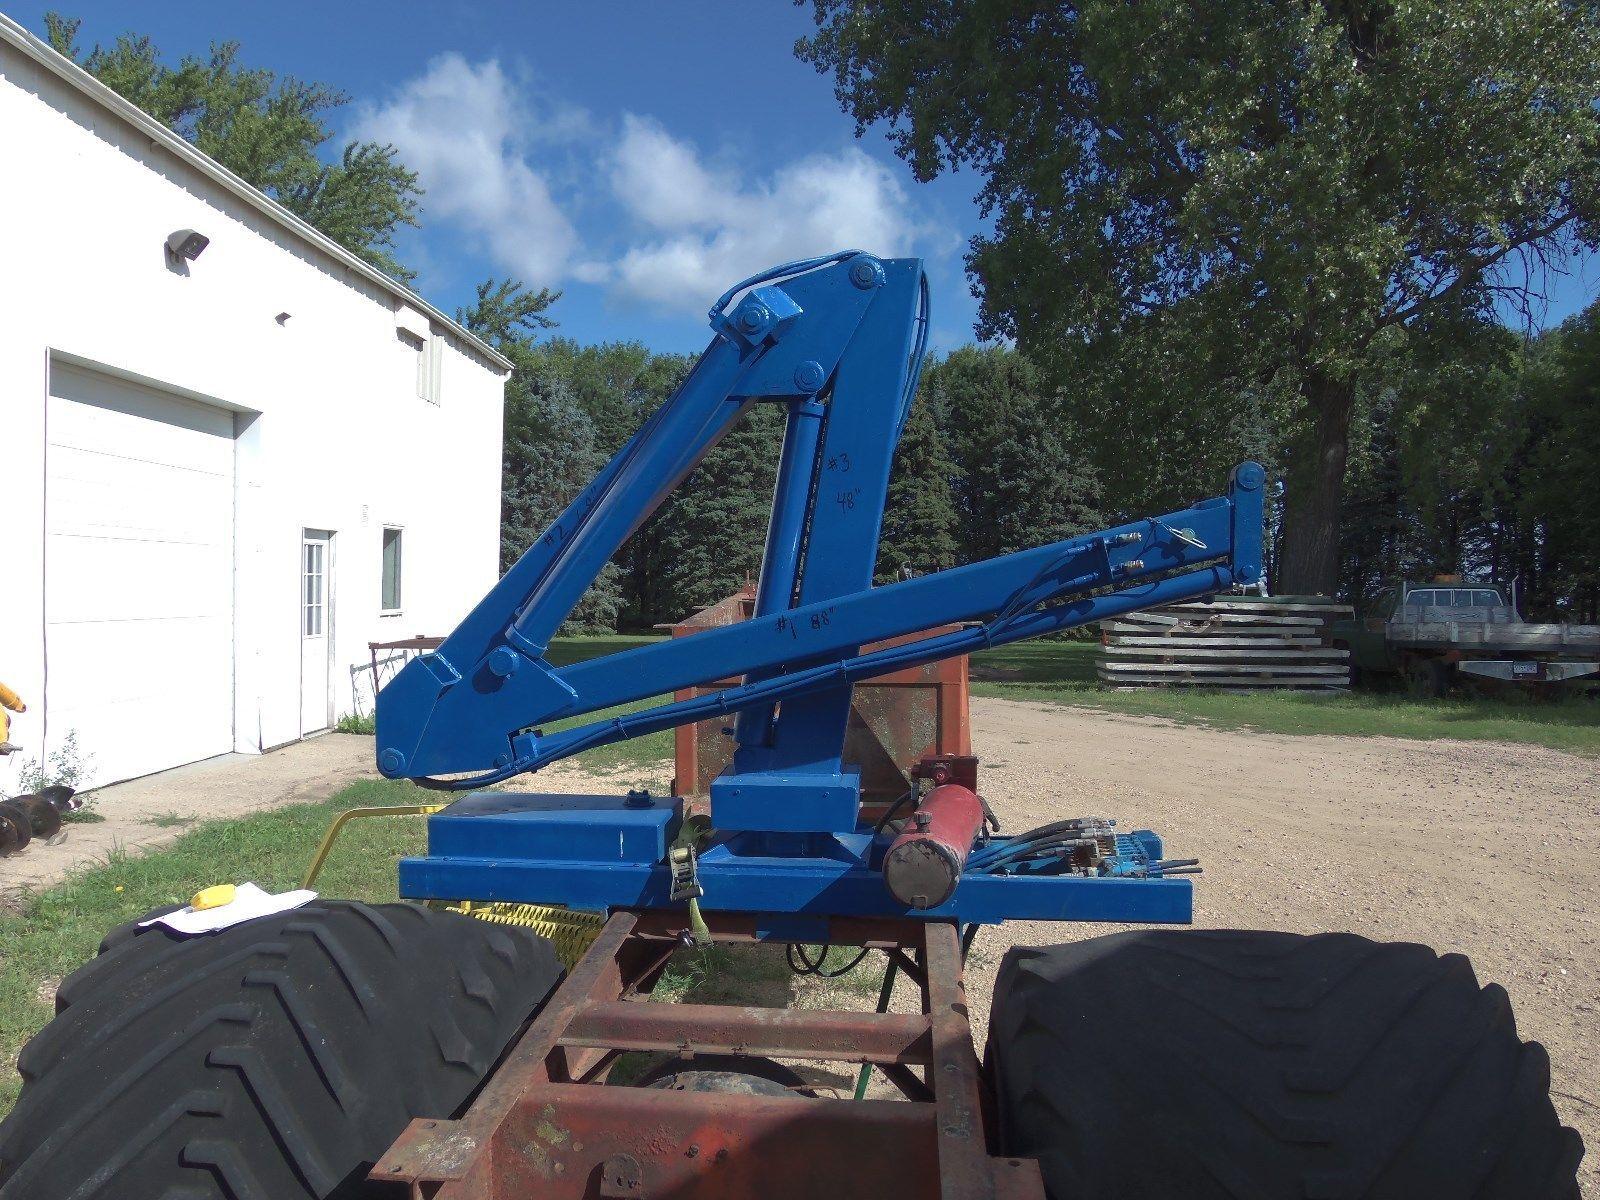 Knuckleboom Articulating Crane   eBay   farm-equip.   Pinterest